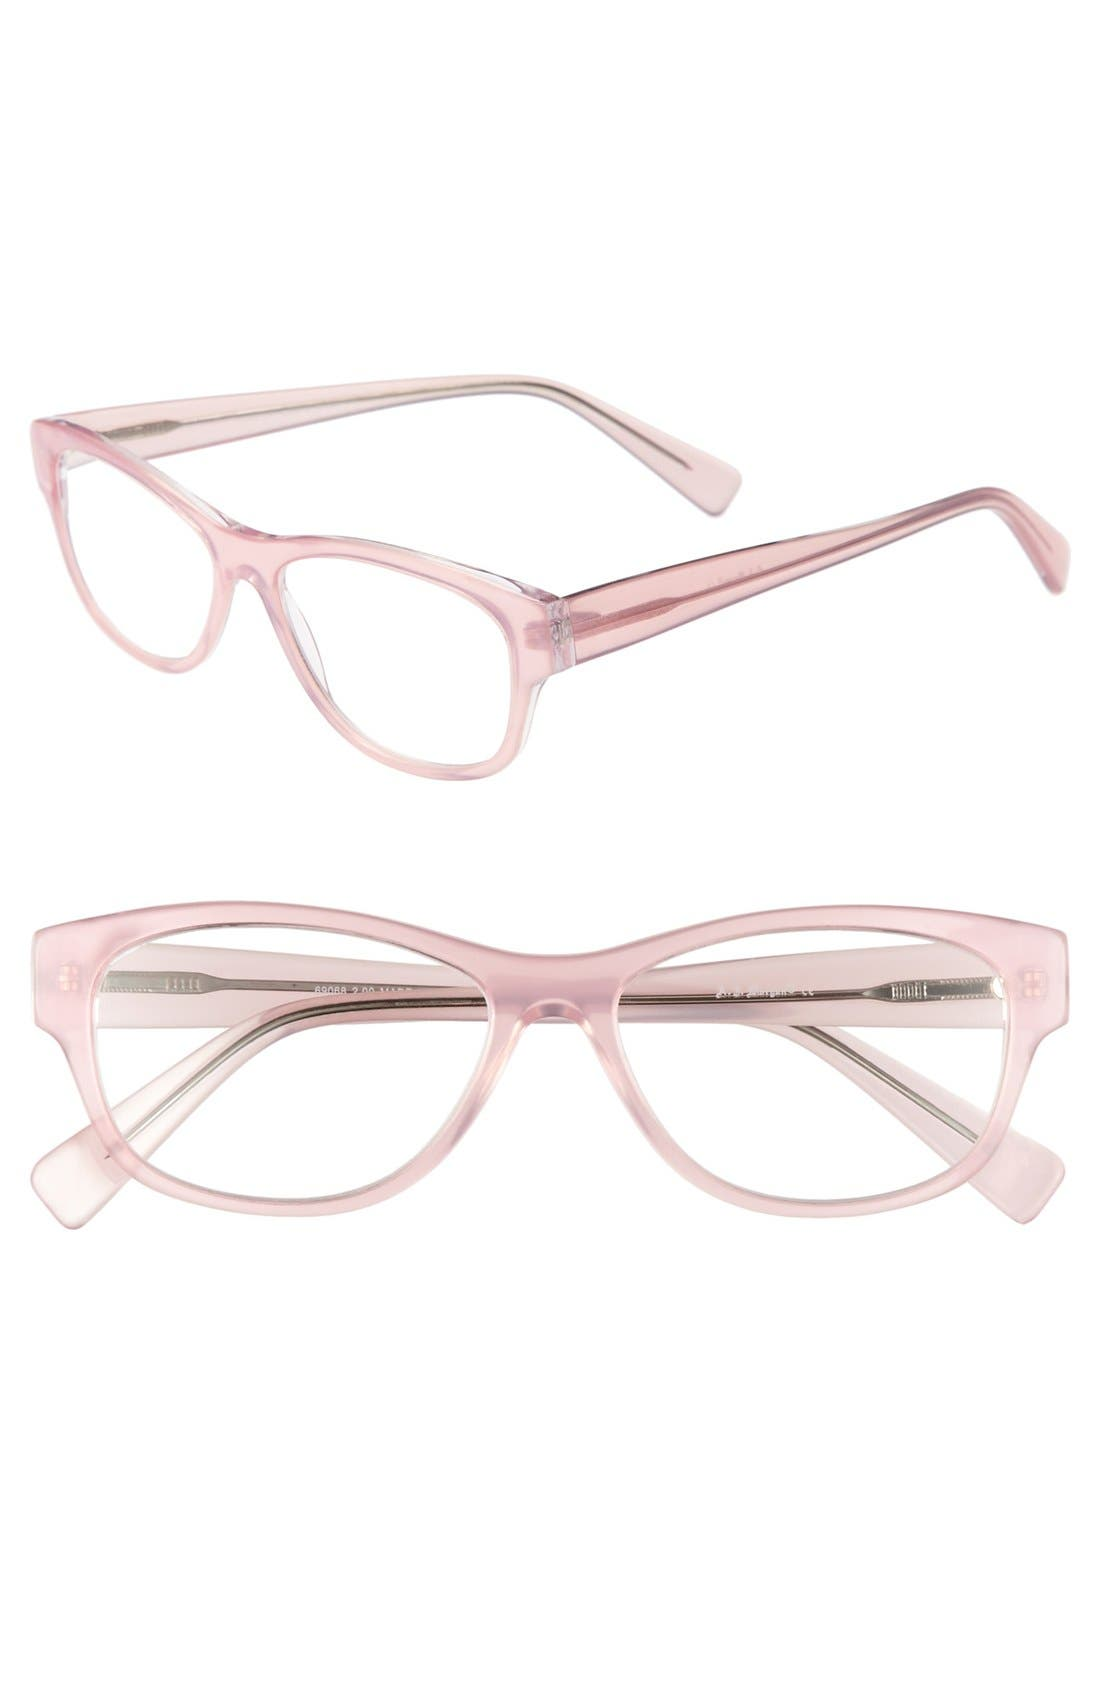 Alternate Image 1 Selected - A.J. Morgan 'Contempo' Reading Glasses